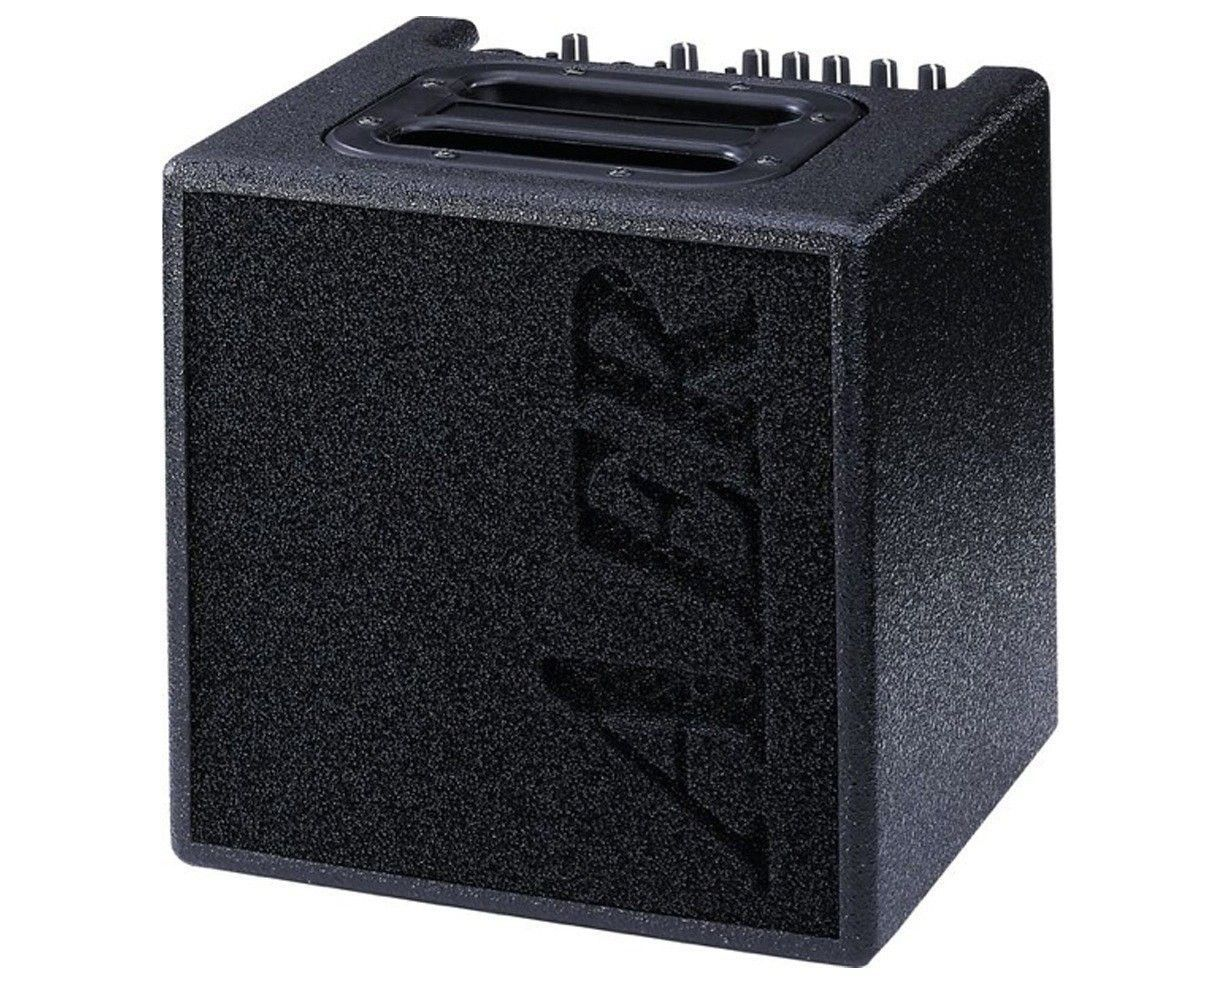 AER Alpha Black Akustik Verstärker B-Ware von Retoure-kein Originalkarton